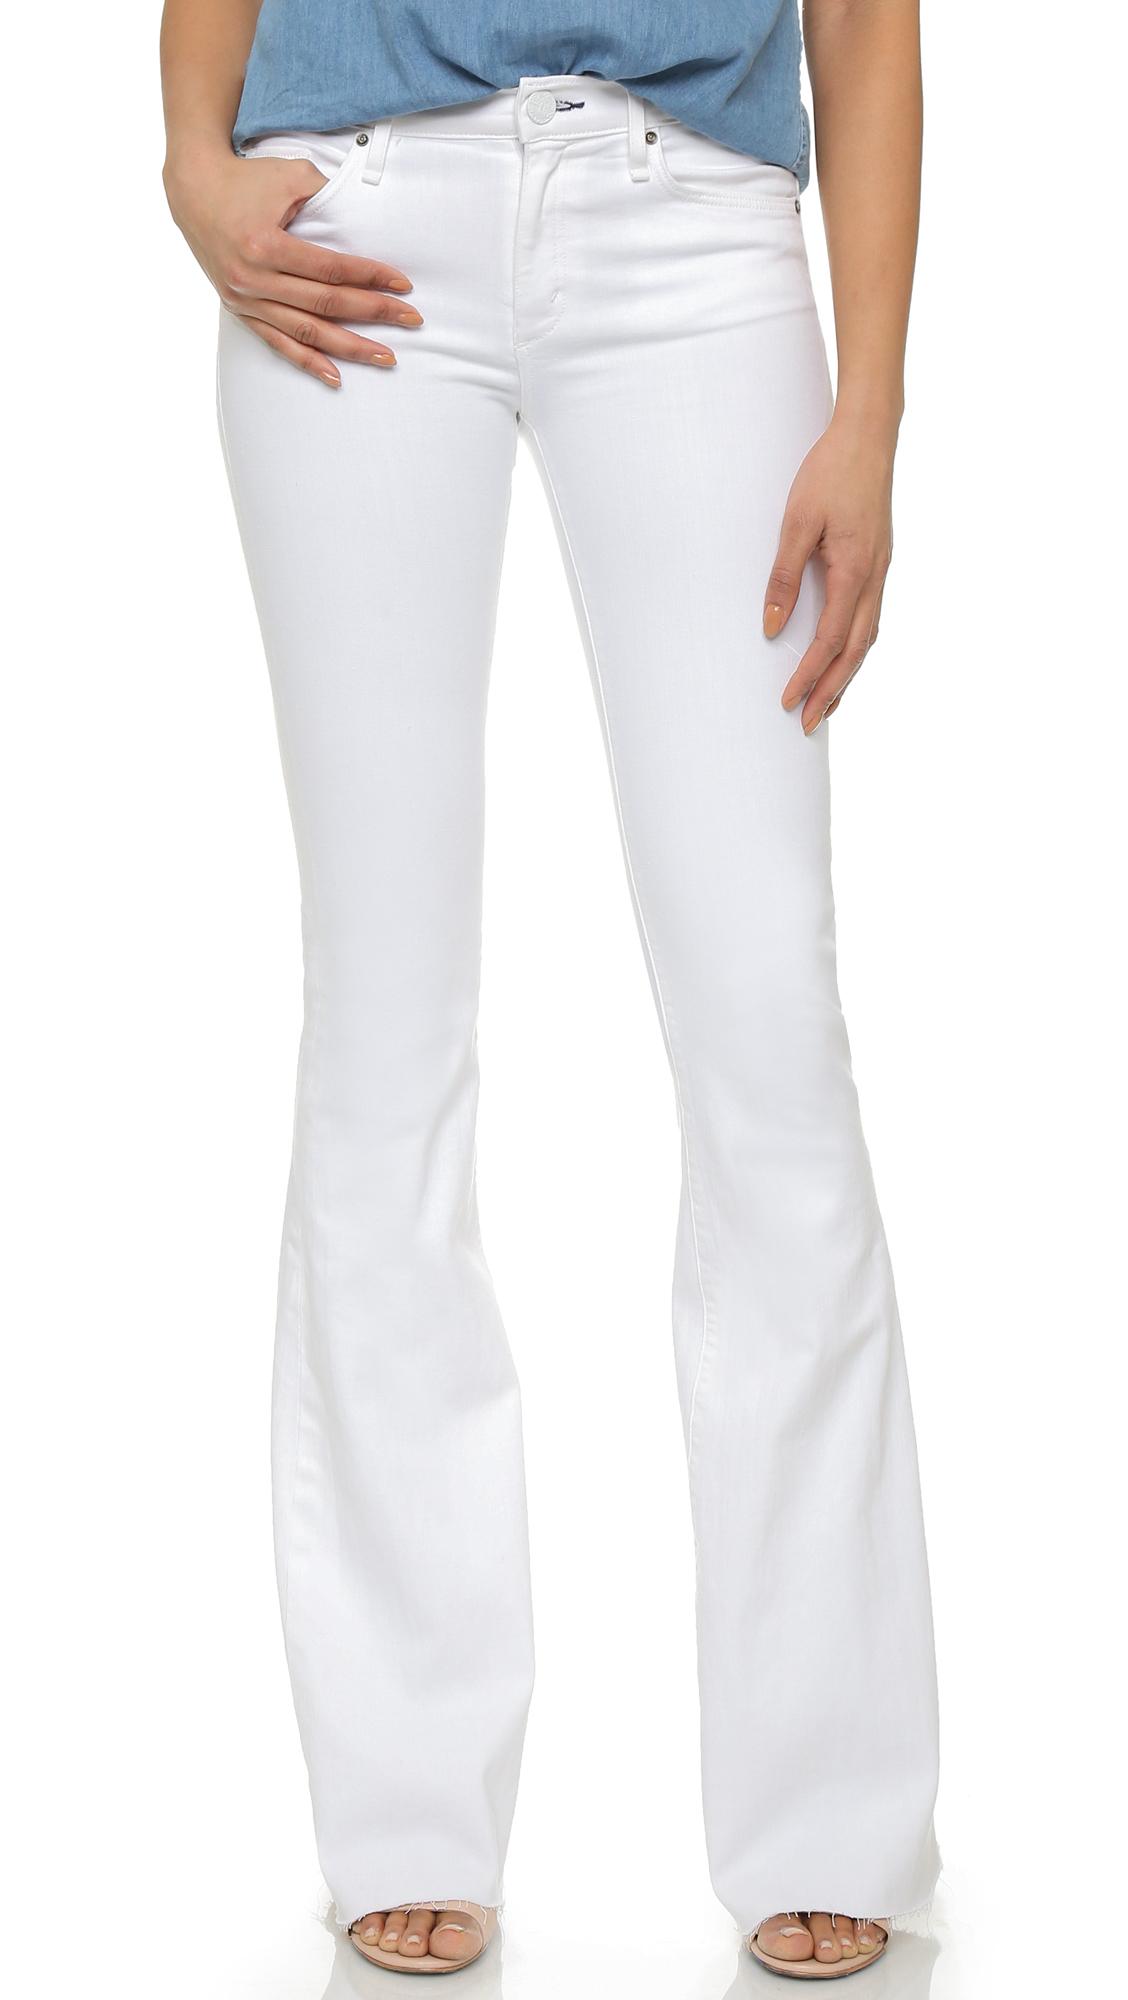 Mcguire denim Majorelle Flare Jeans in White | Lyst